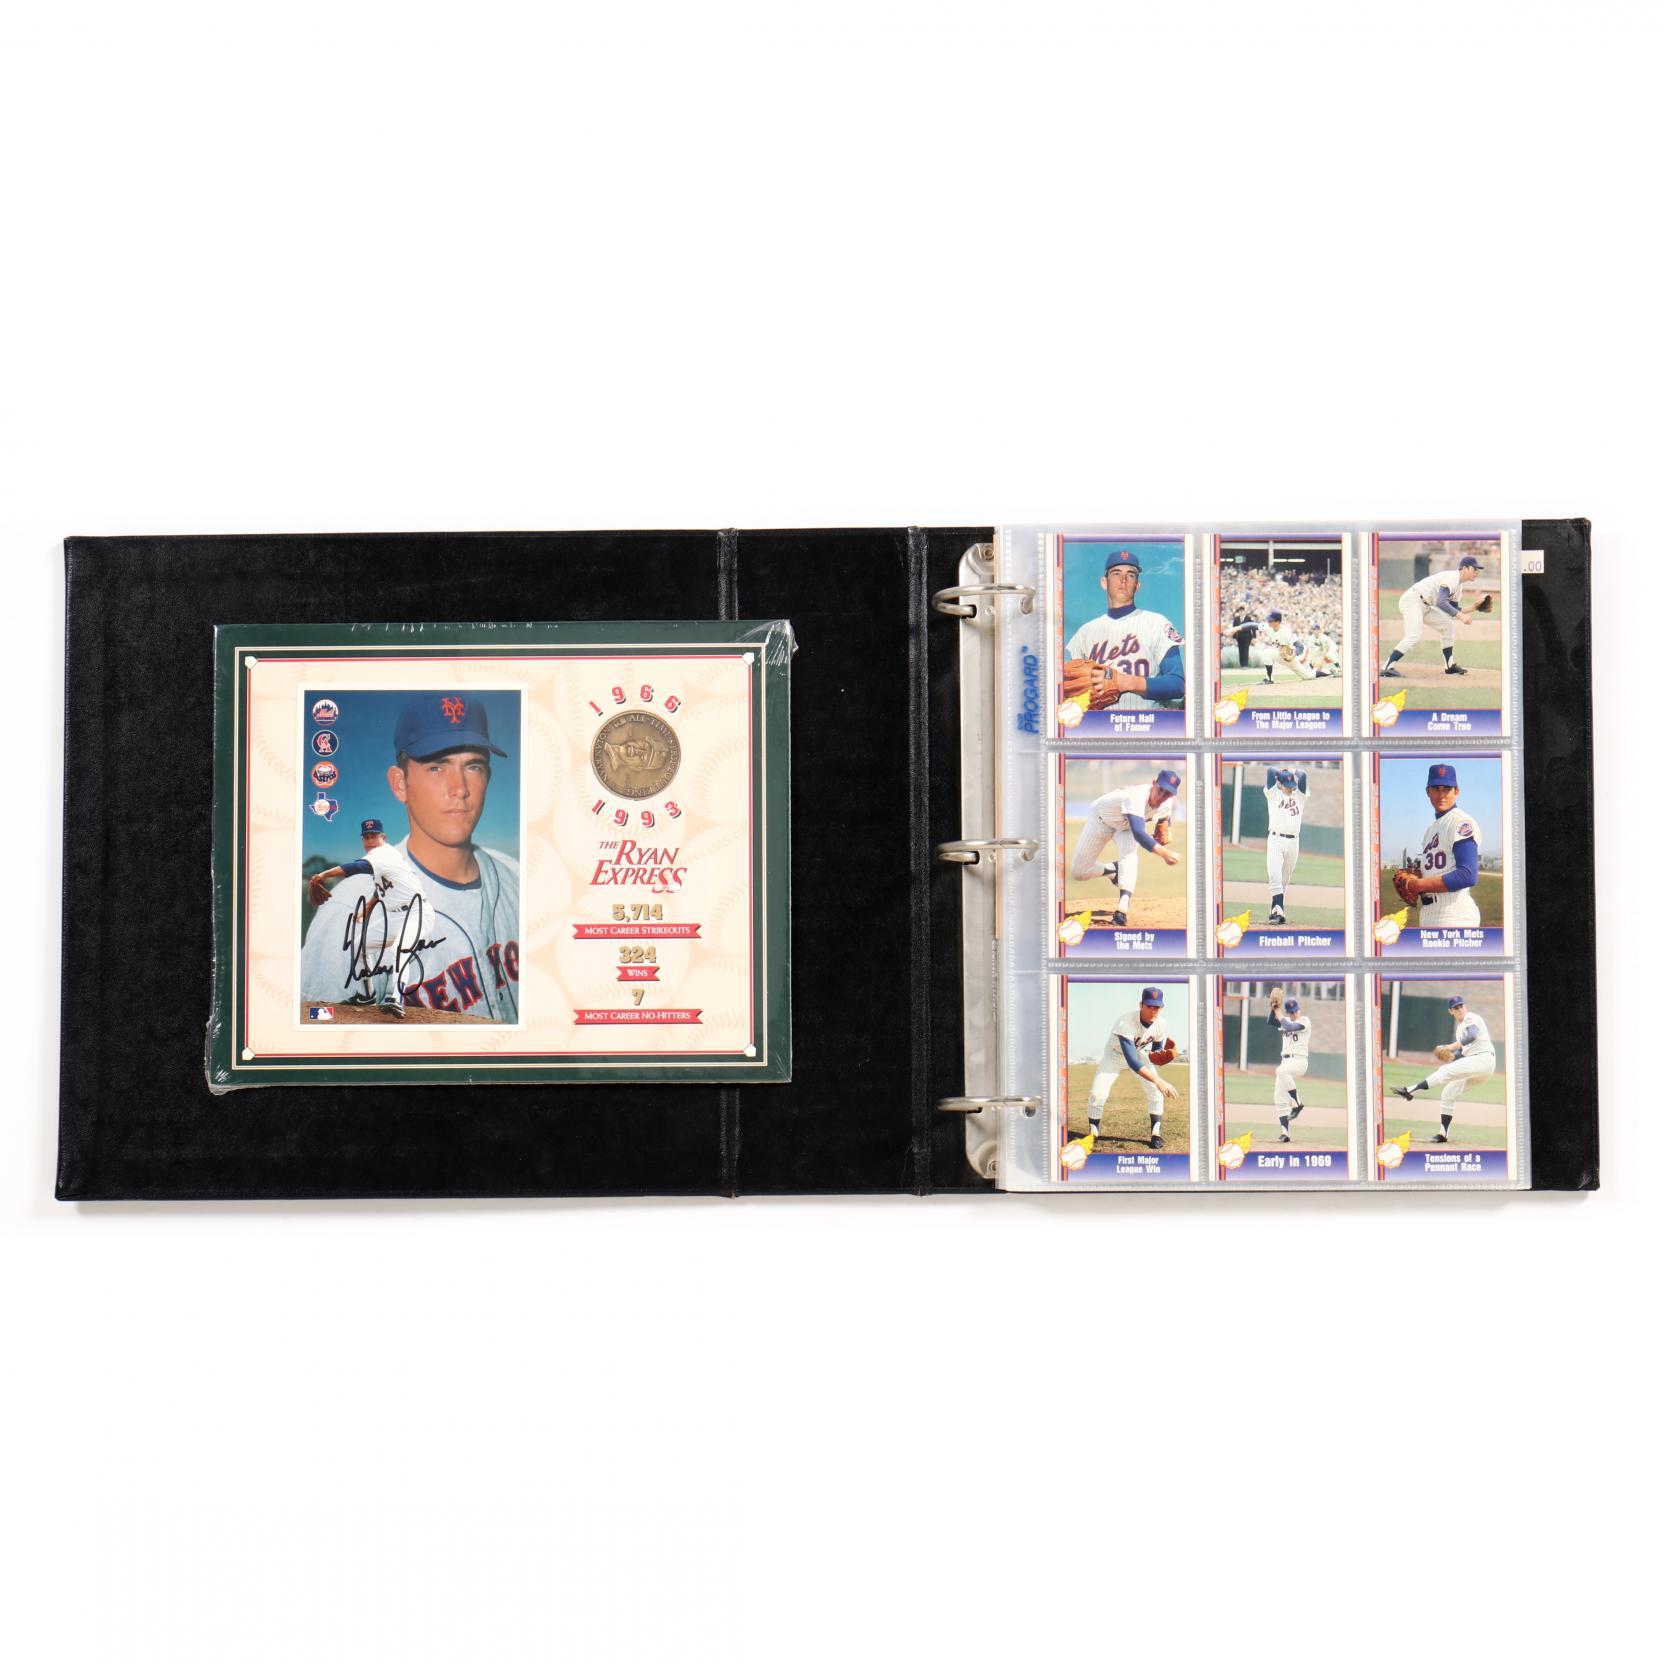 nolan-ryan-1991-pacific-baseball-card-album-with-signed-photo